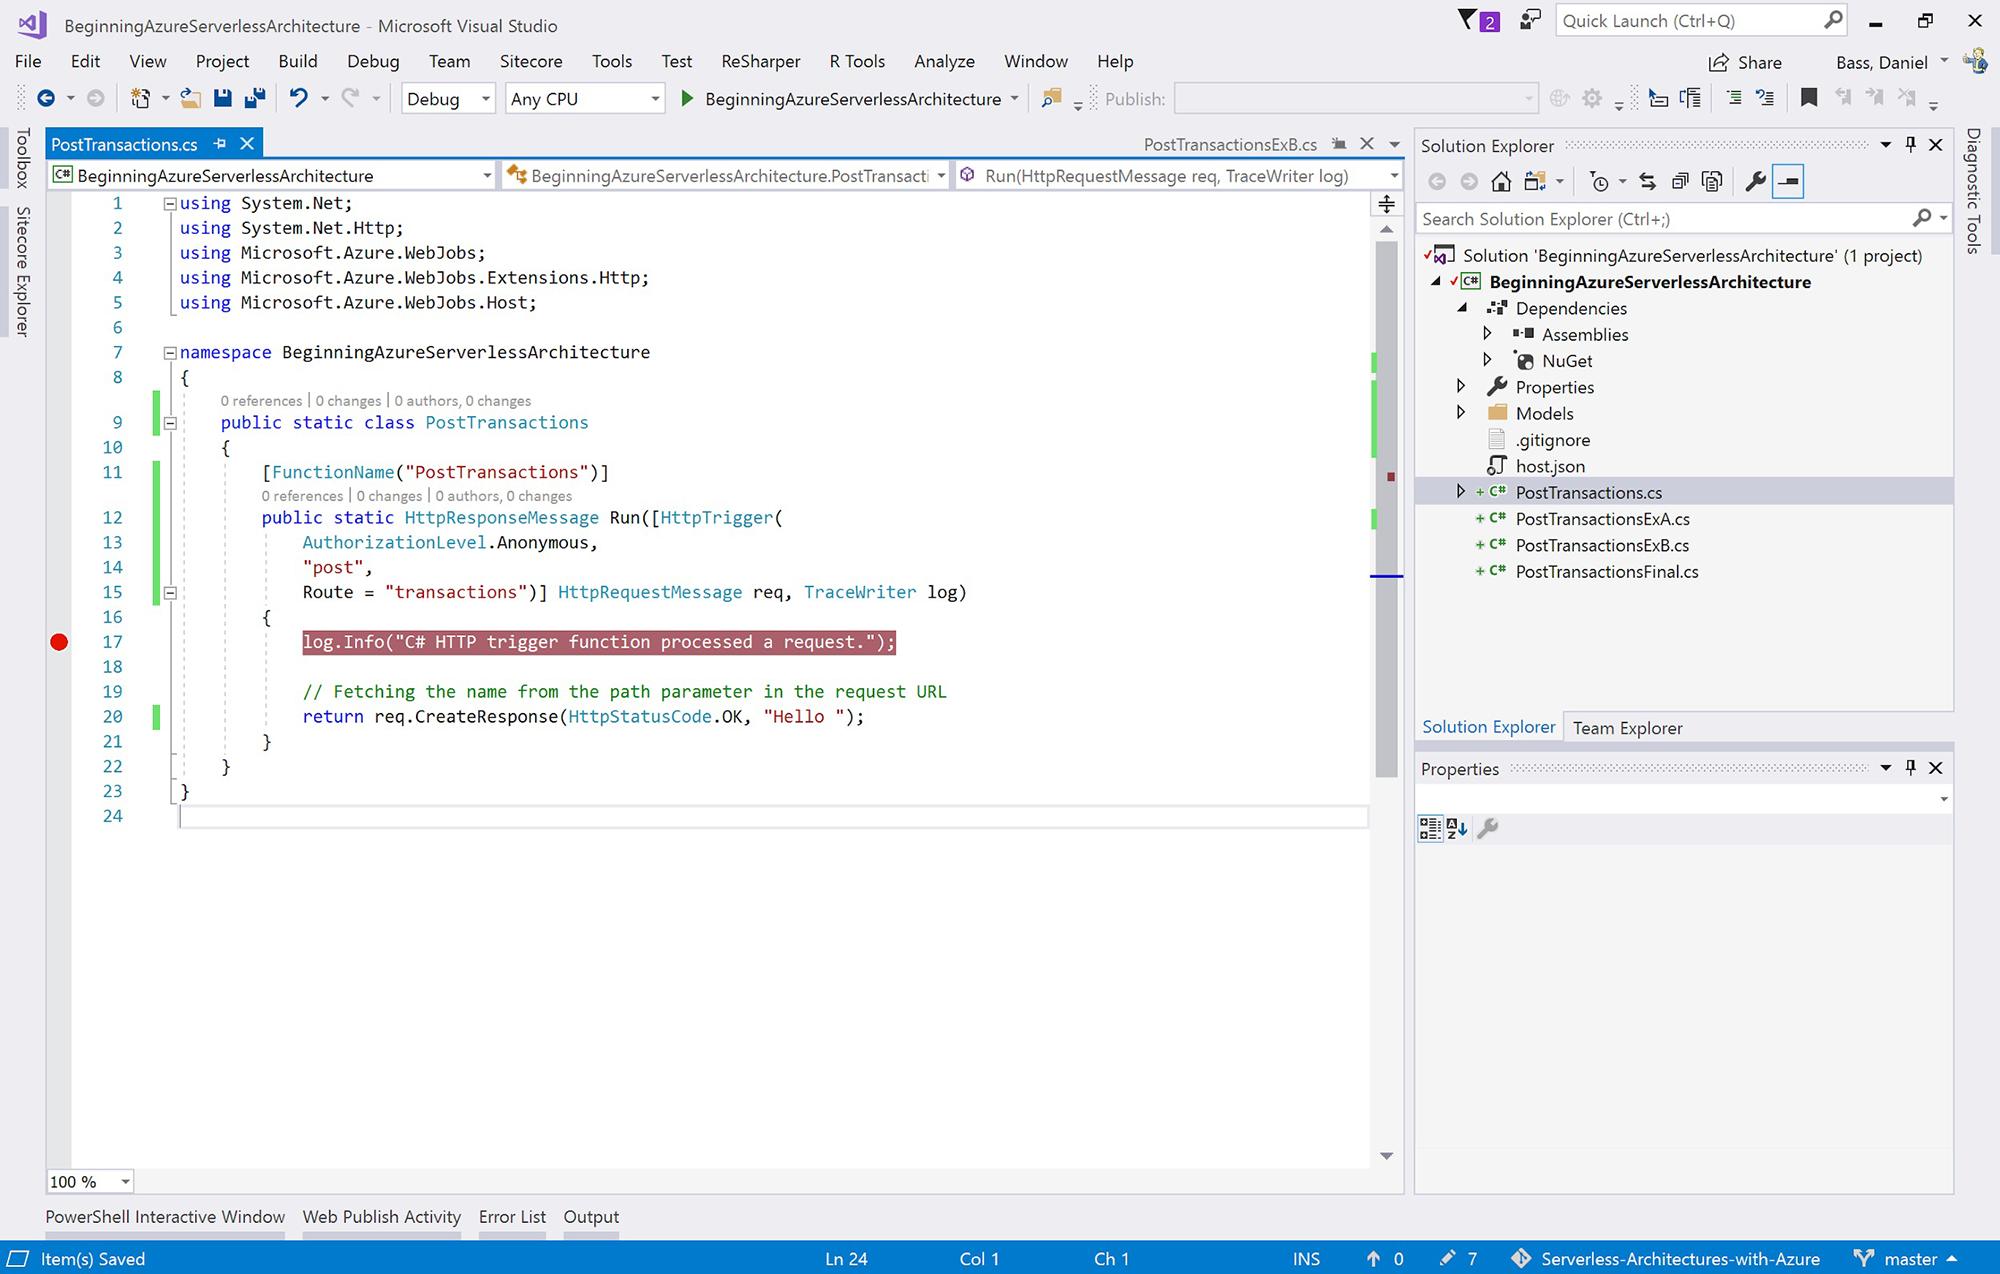 Creating, Debugging, and Deploying an Azure Function